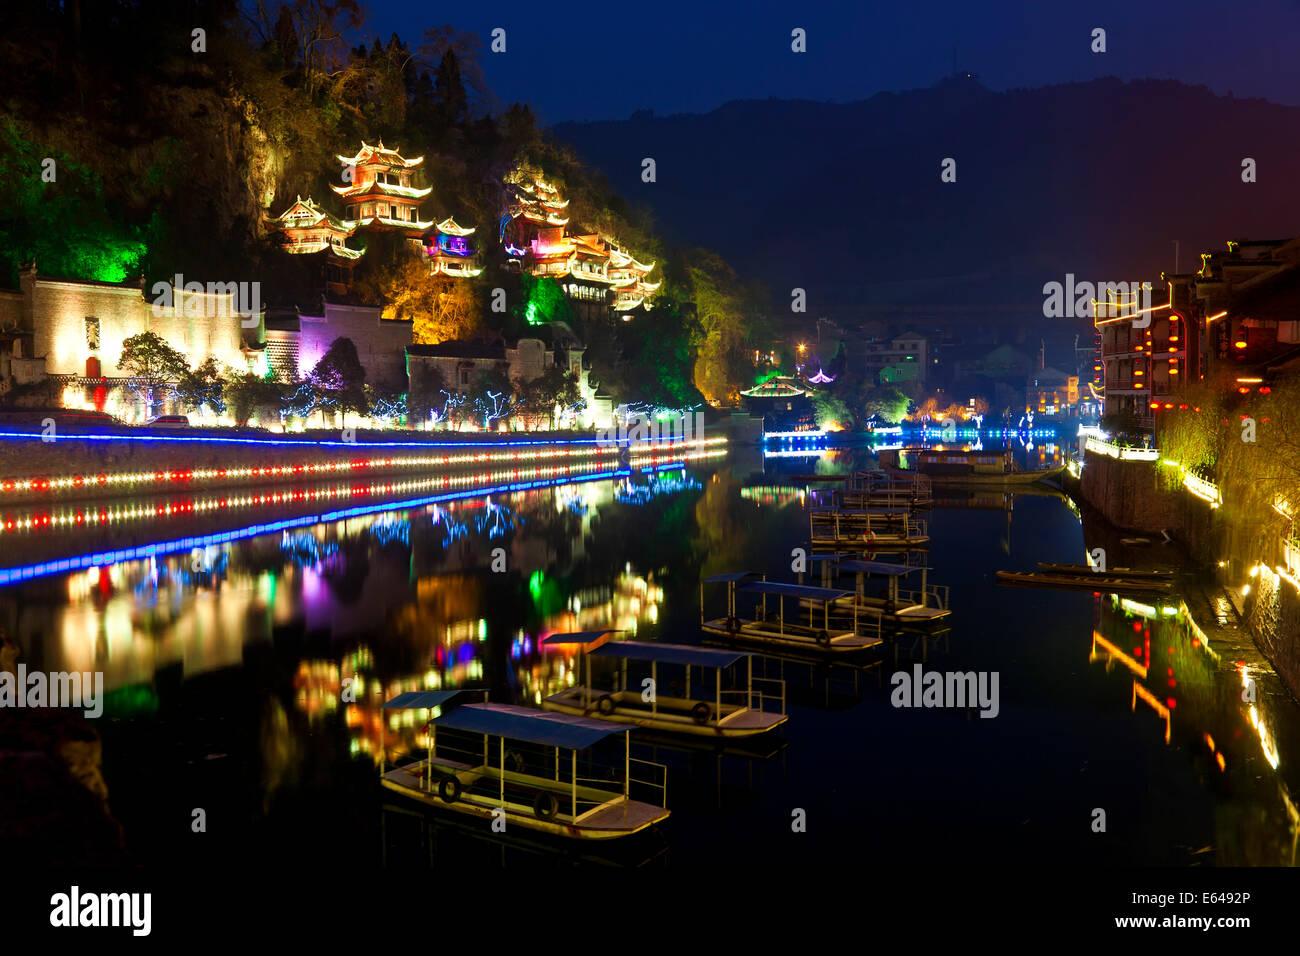 Zhenyuan allumé au crépuscule, Zhenyuan, Guizhou, Chine Photo Stock